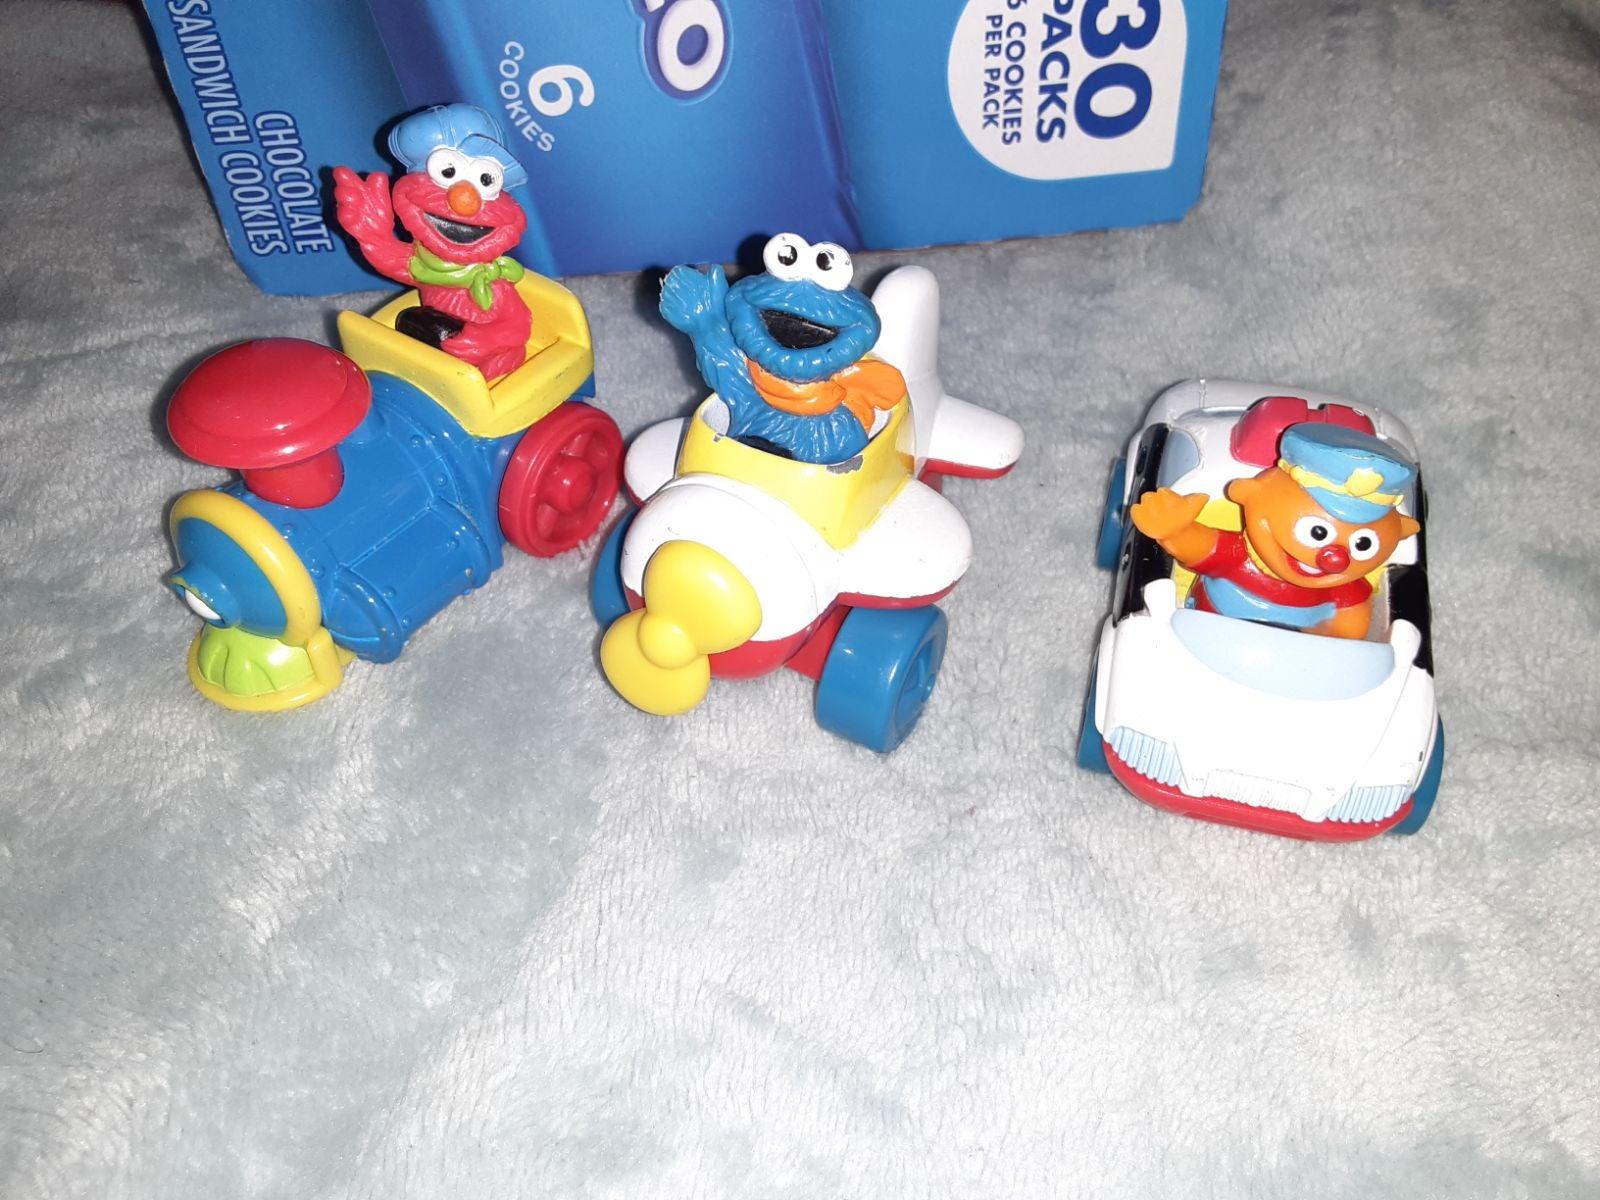 Sesame street vehicles